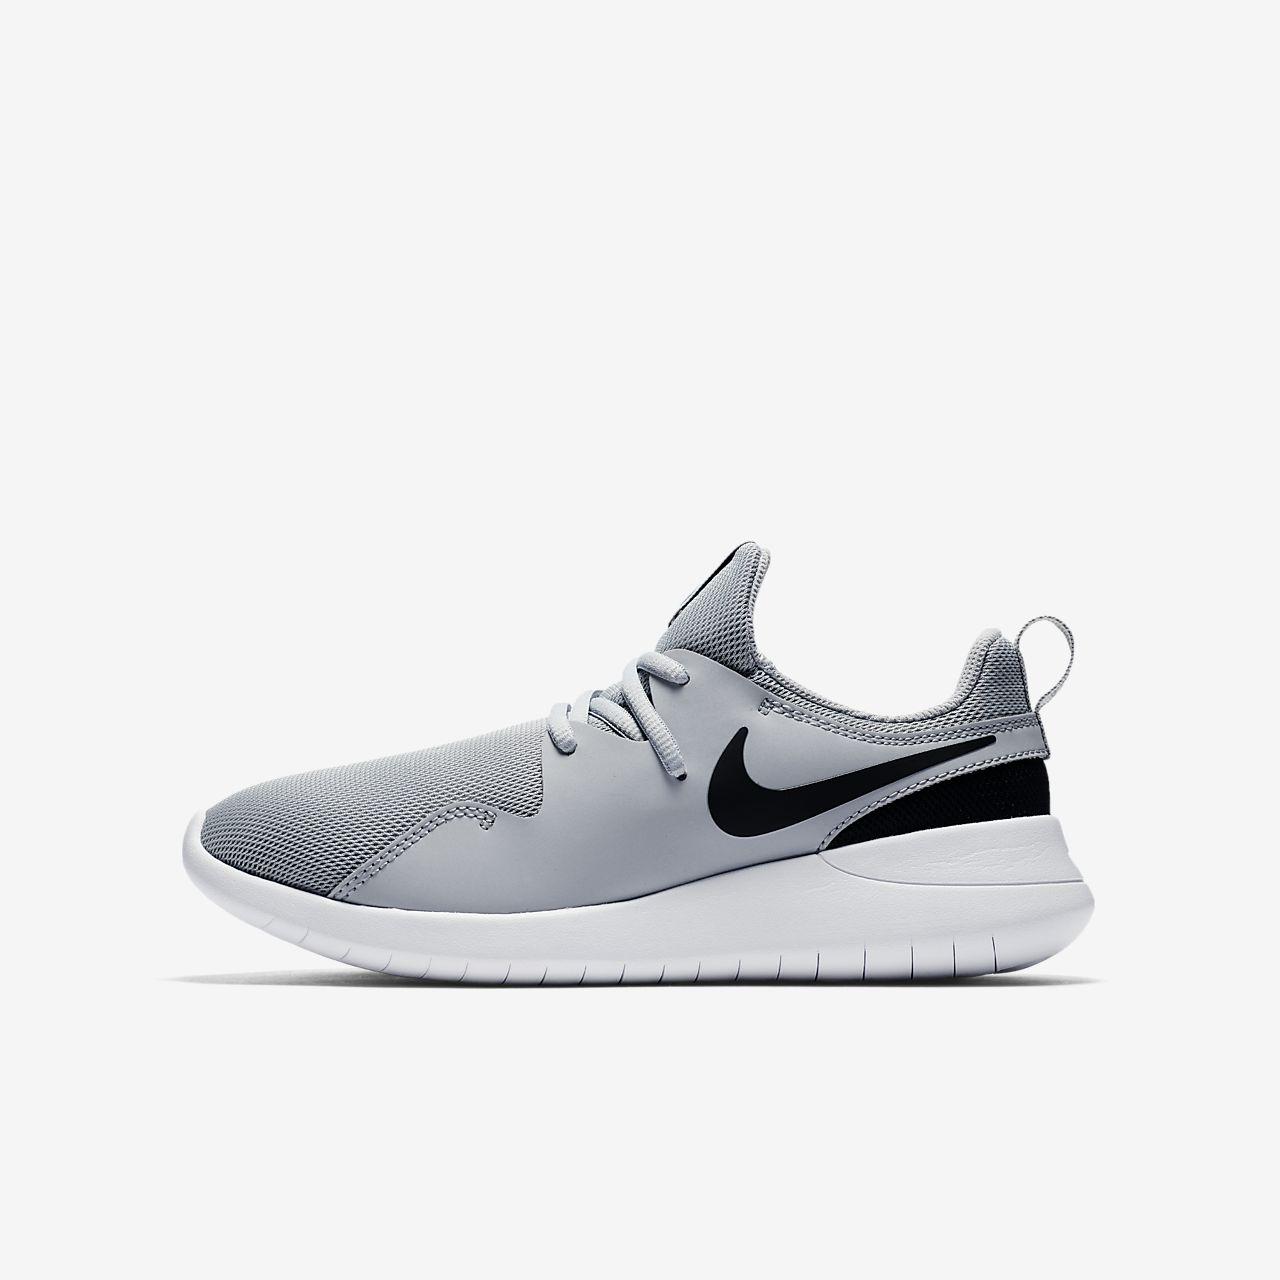 online store 225c8 0b2a3 Nike Tessen Zapatillas - Niño/a. Nike.com ES